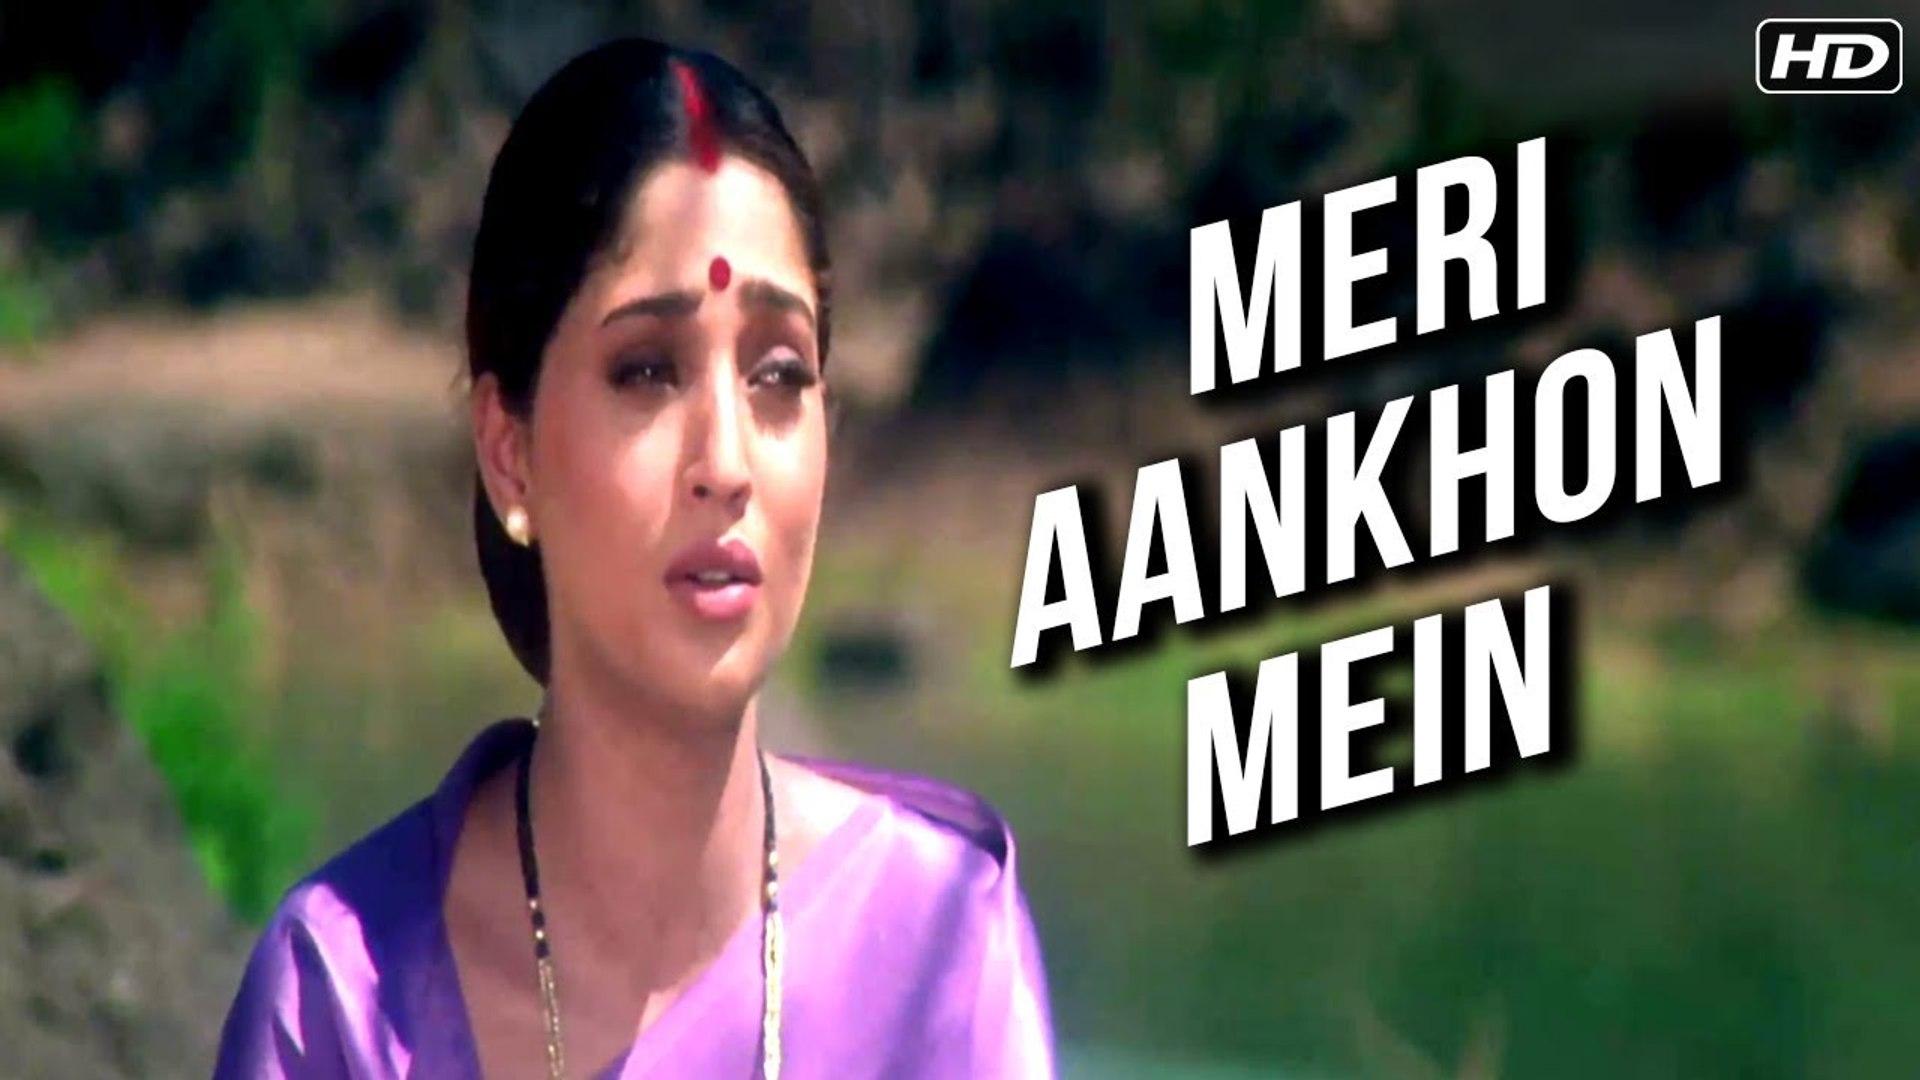 Meri Aankhon Mein (HD) | Ankhon Mein Tum Ho Songs | Anuradha Paudwal |  Hindi Bollywood Songs